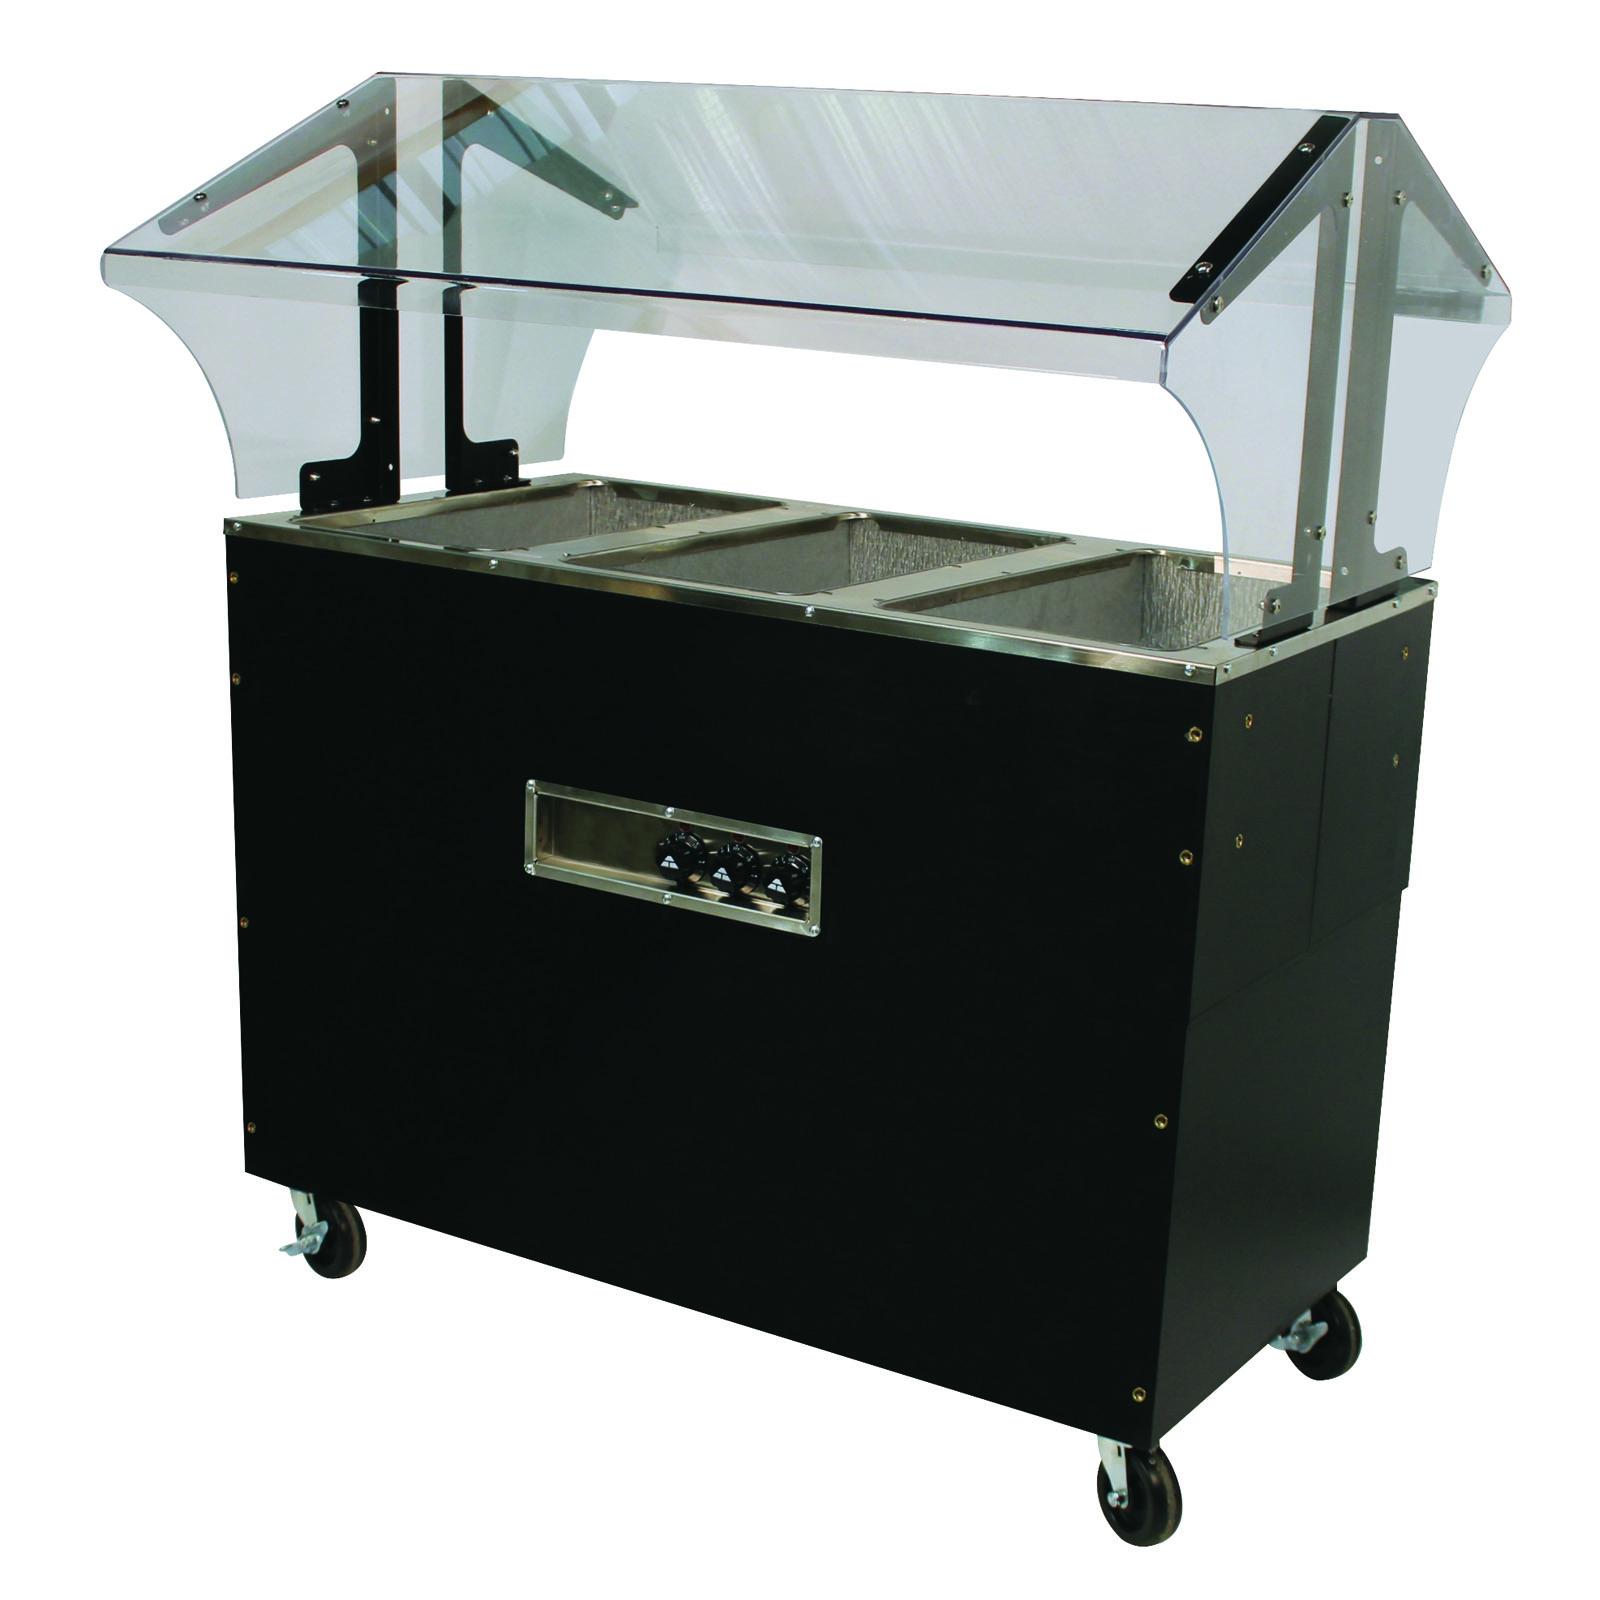 Advance Tabco B3-120-B-S-SB serving counter, hot food, electric